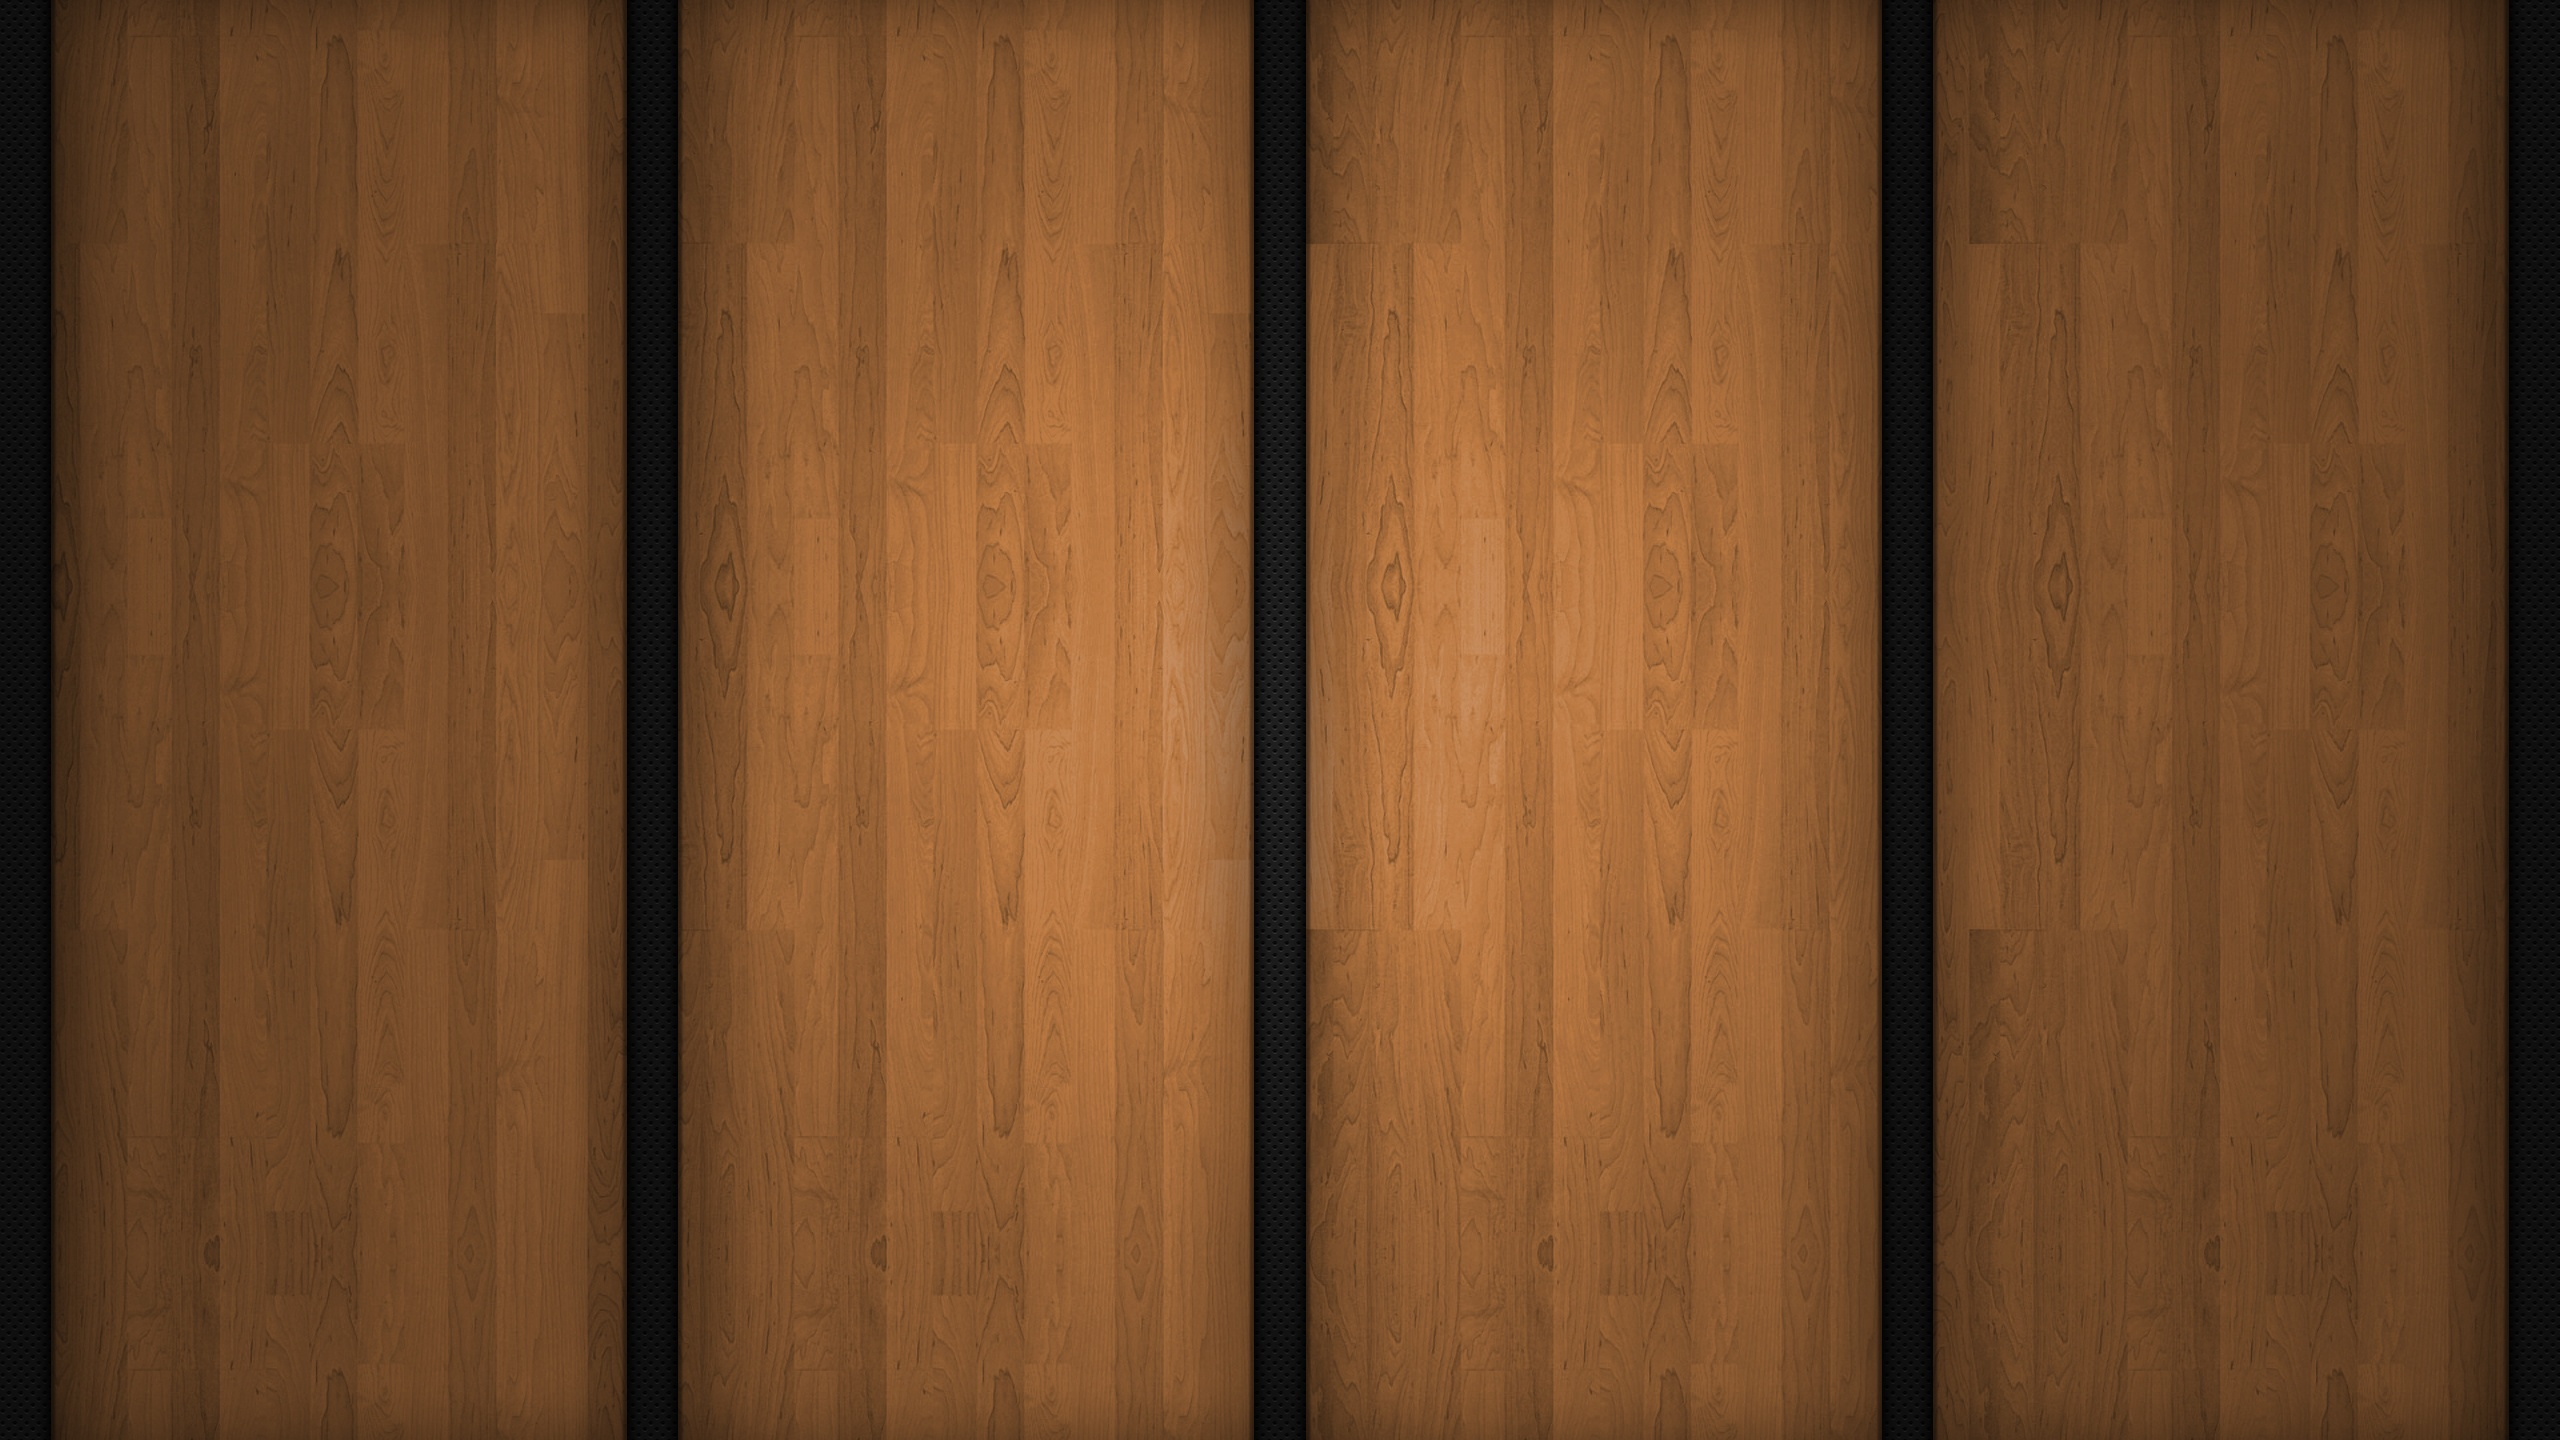 Wallpaper Squares Tiles 2560x1440